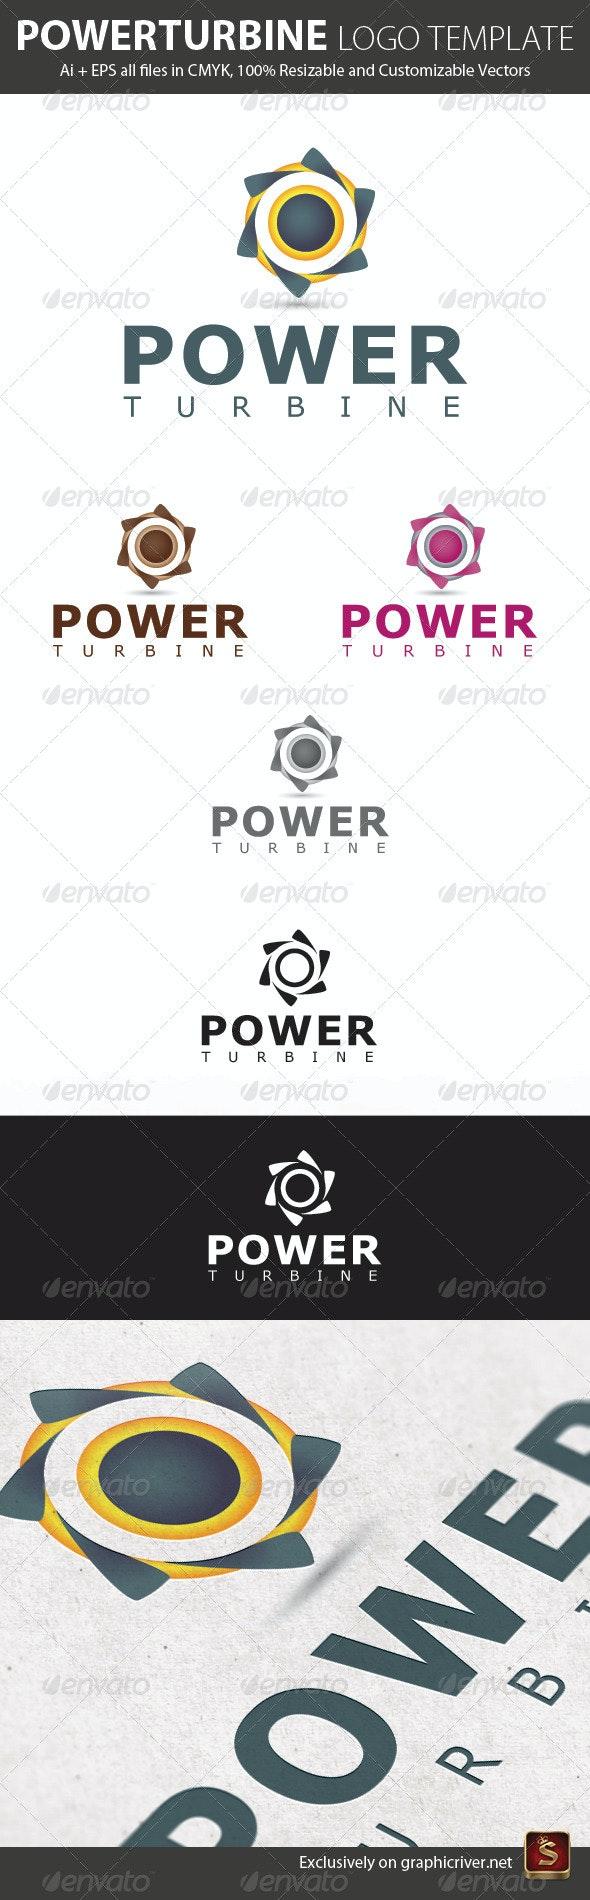 Power Turbine Logo Template - Vector Abstract